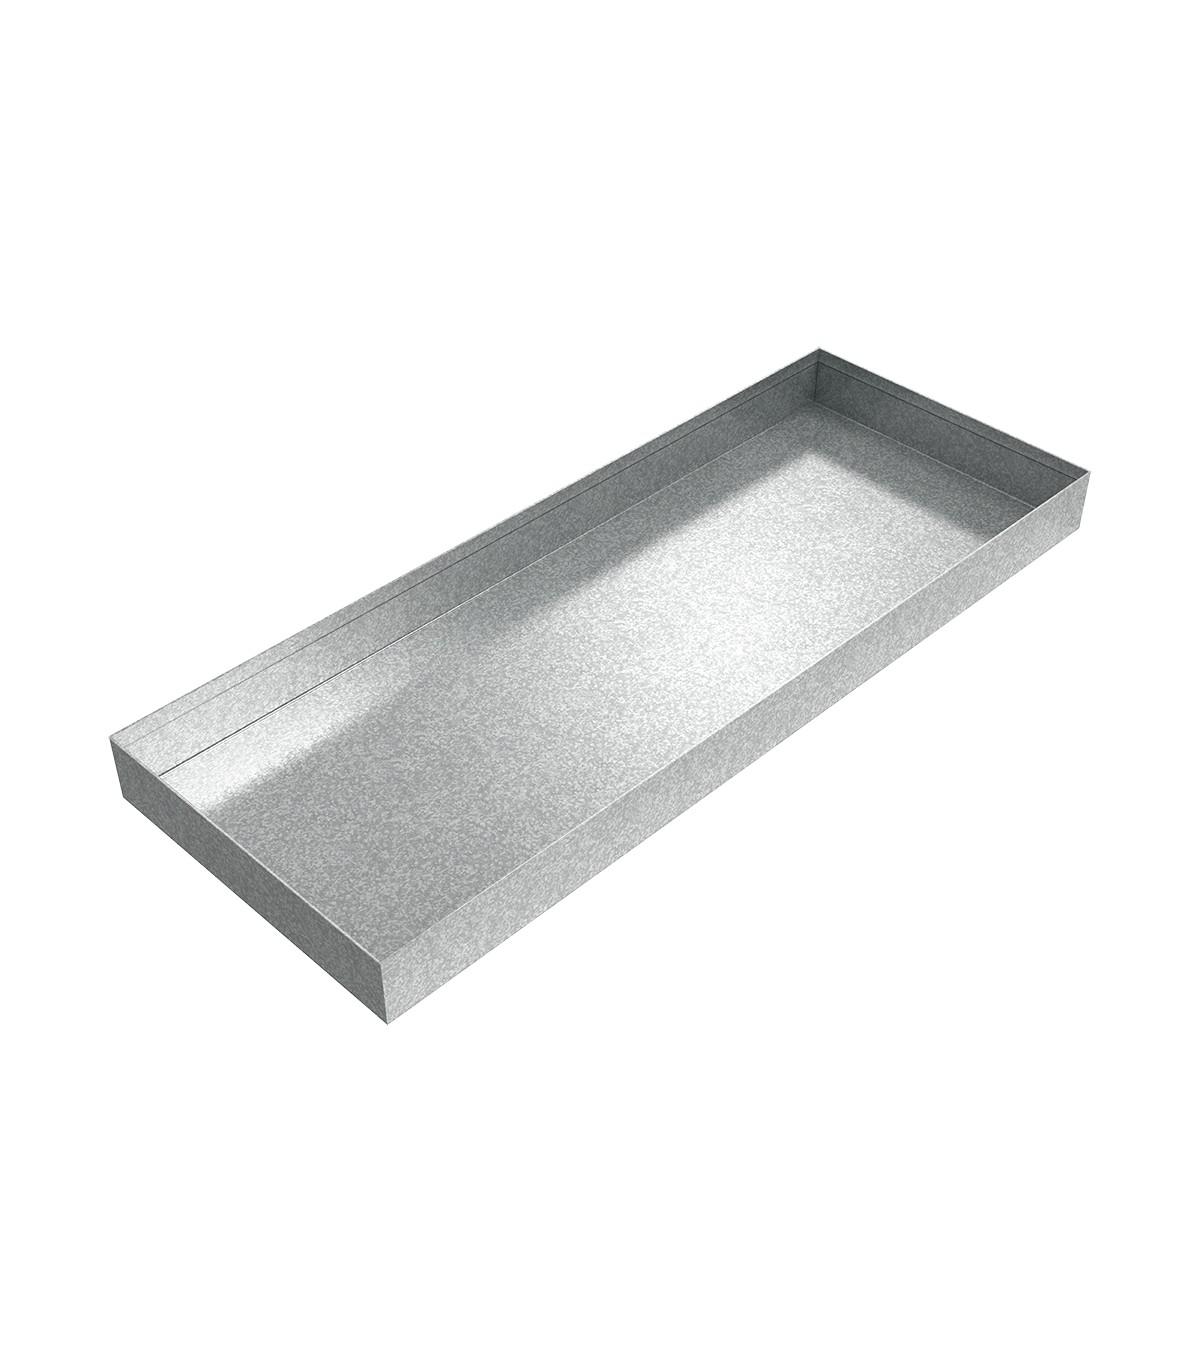 Oil Heater Drip Pan